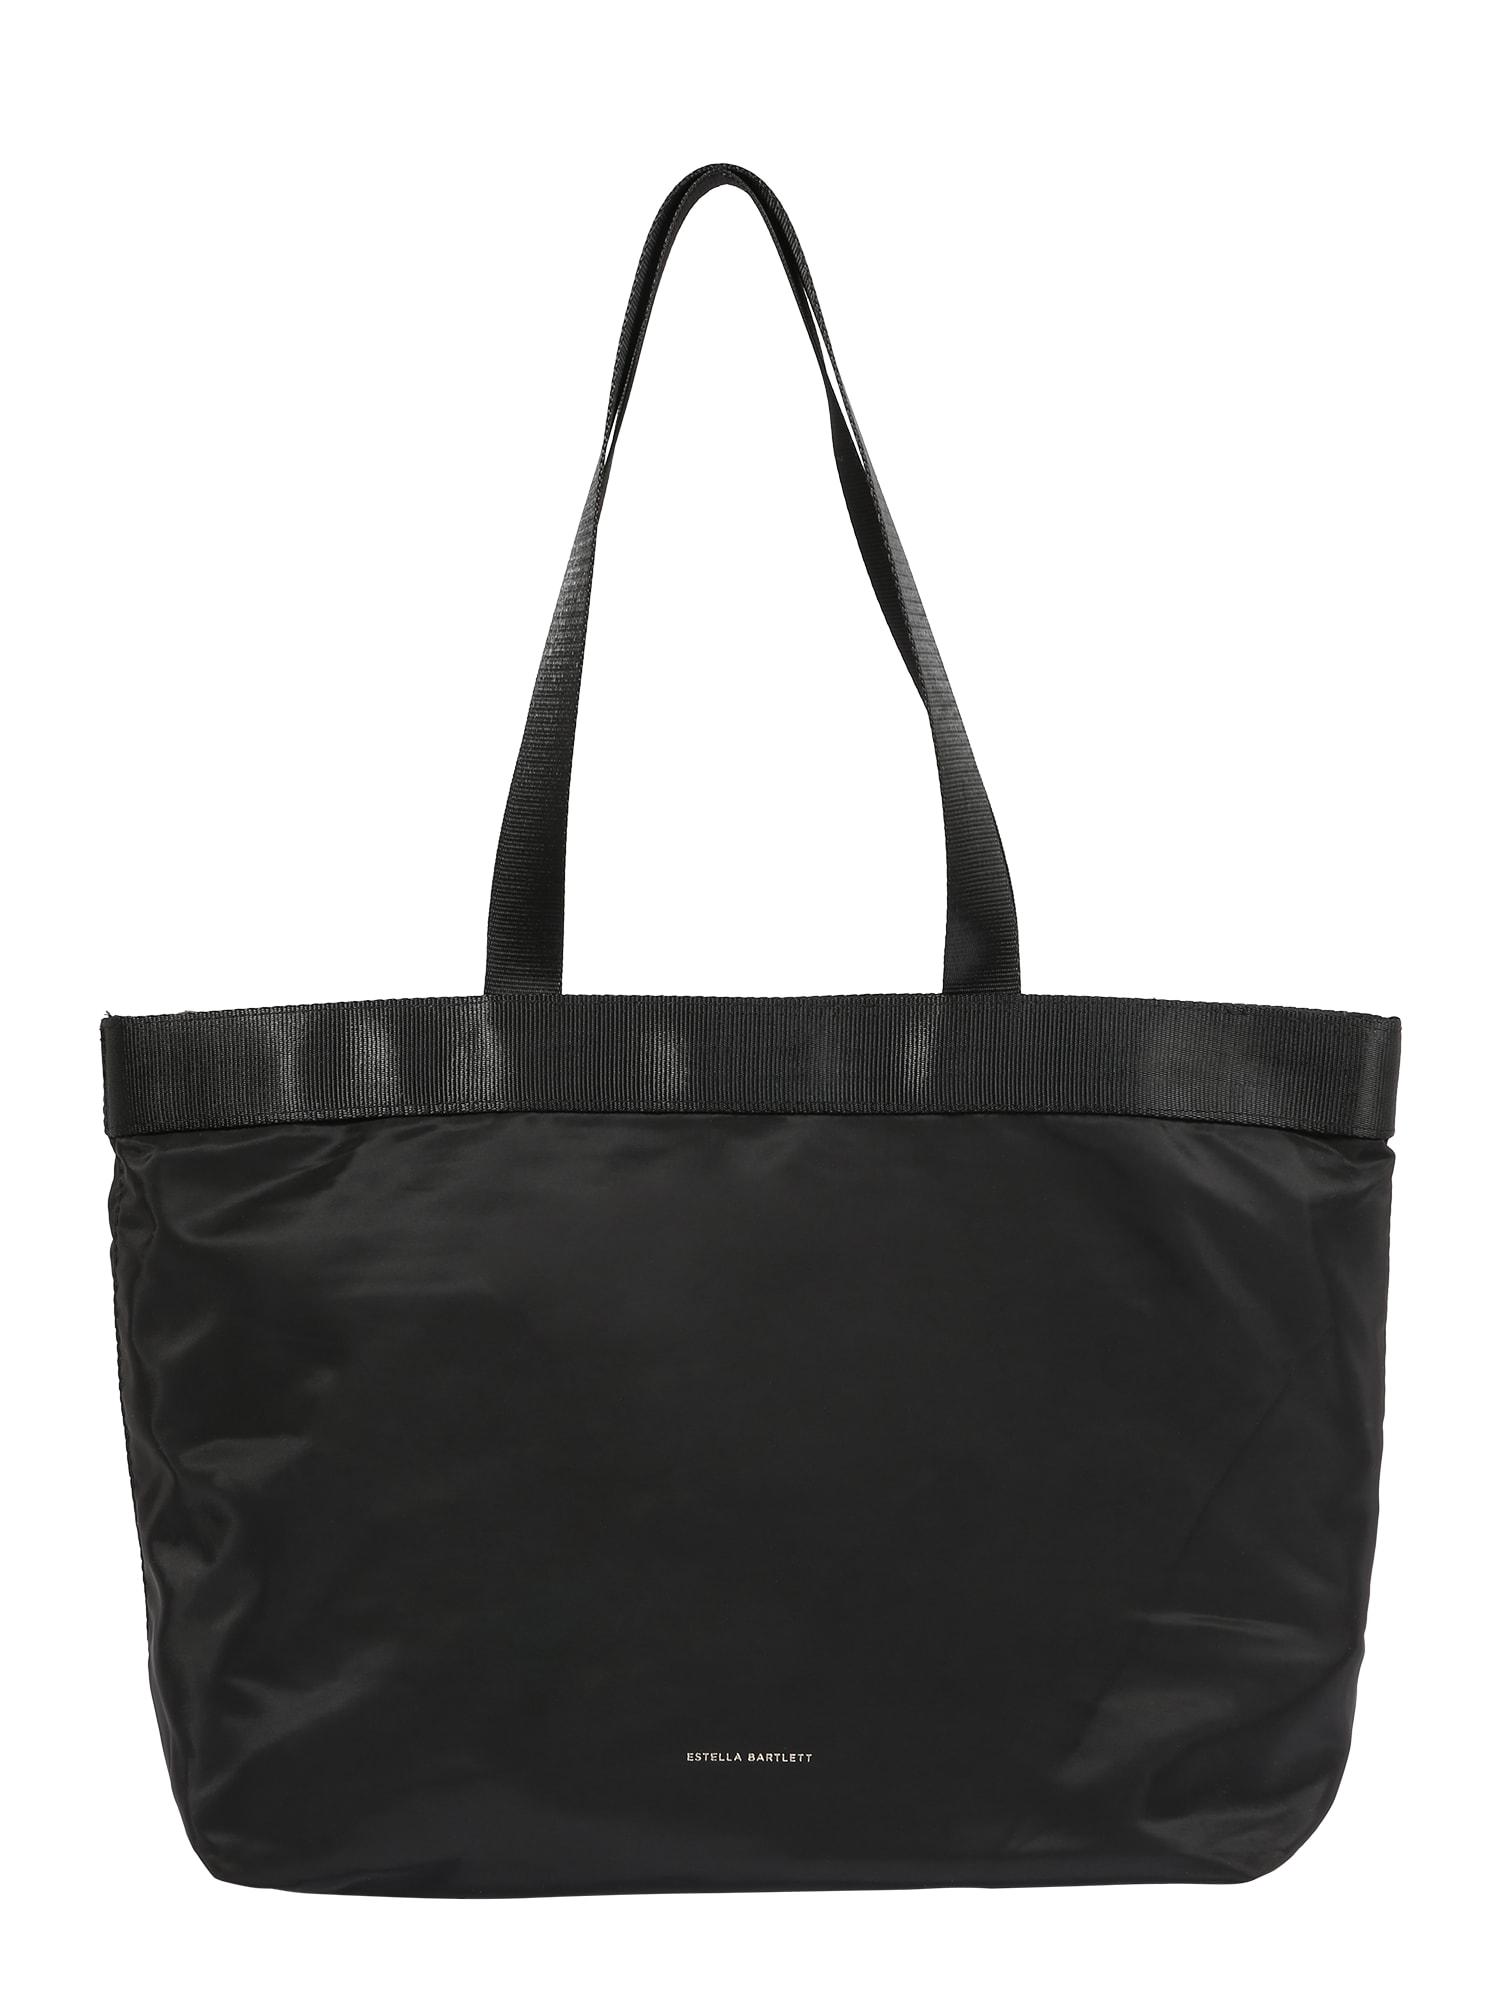 Estella Bartlett Pirkinių krepšys